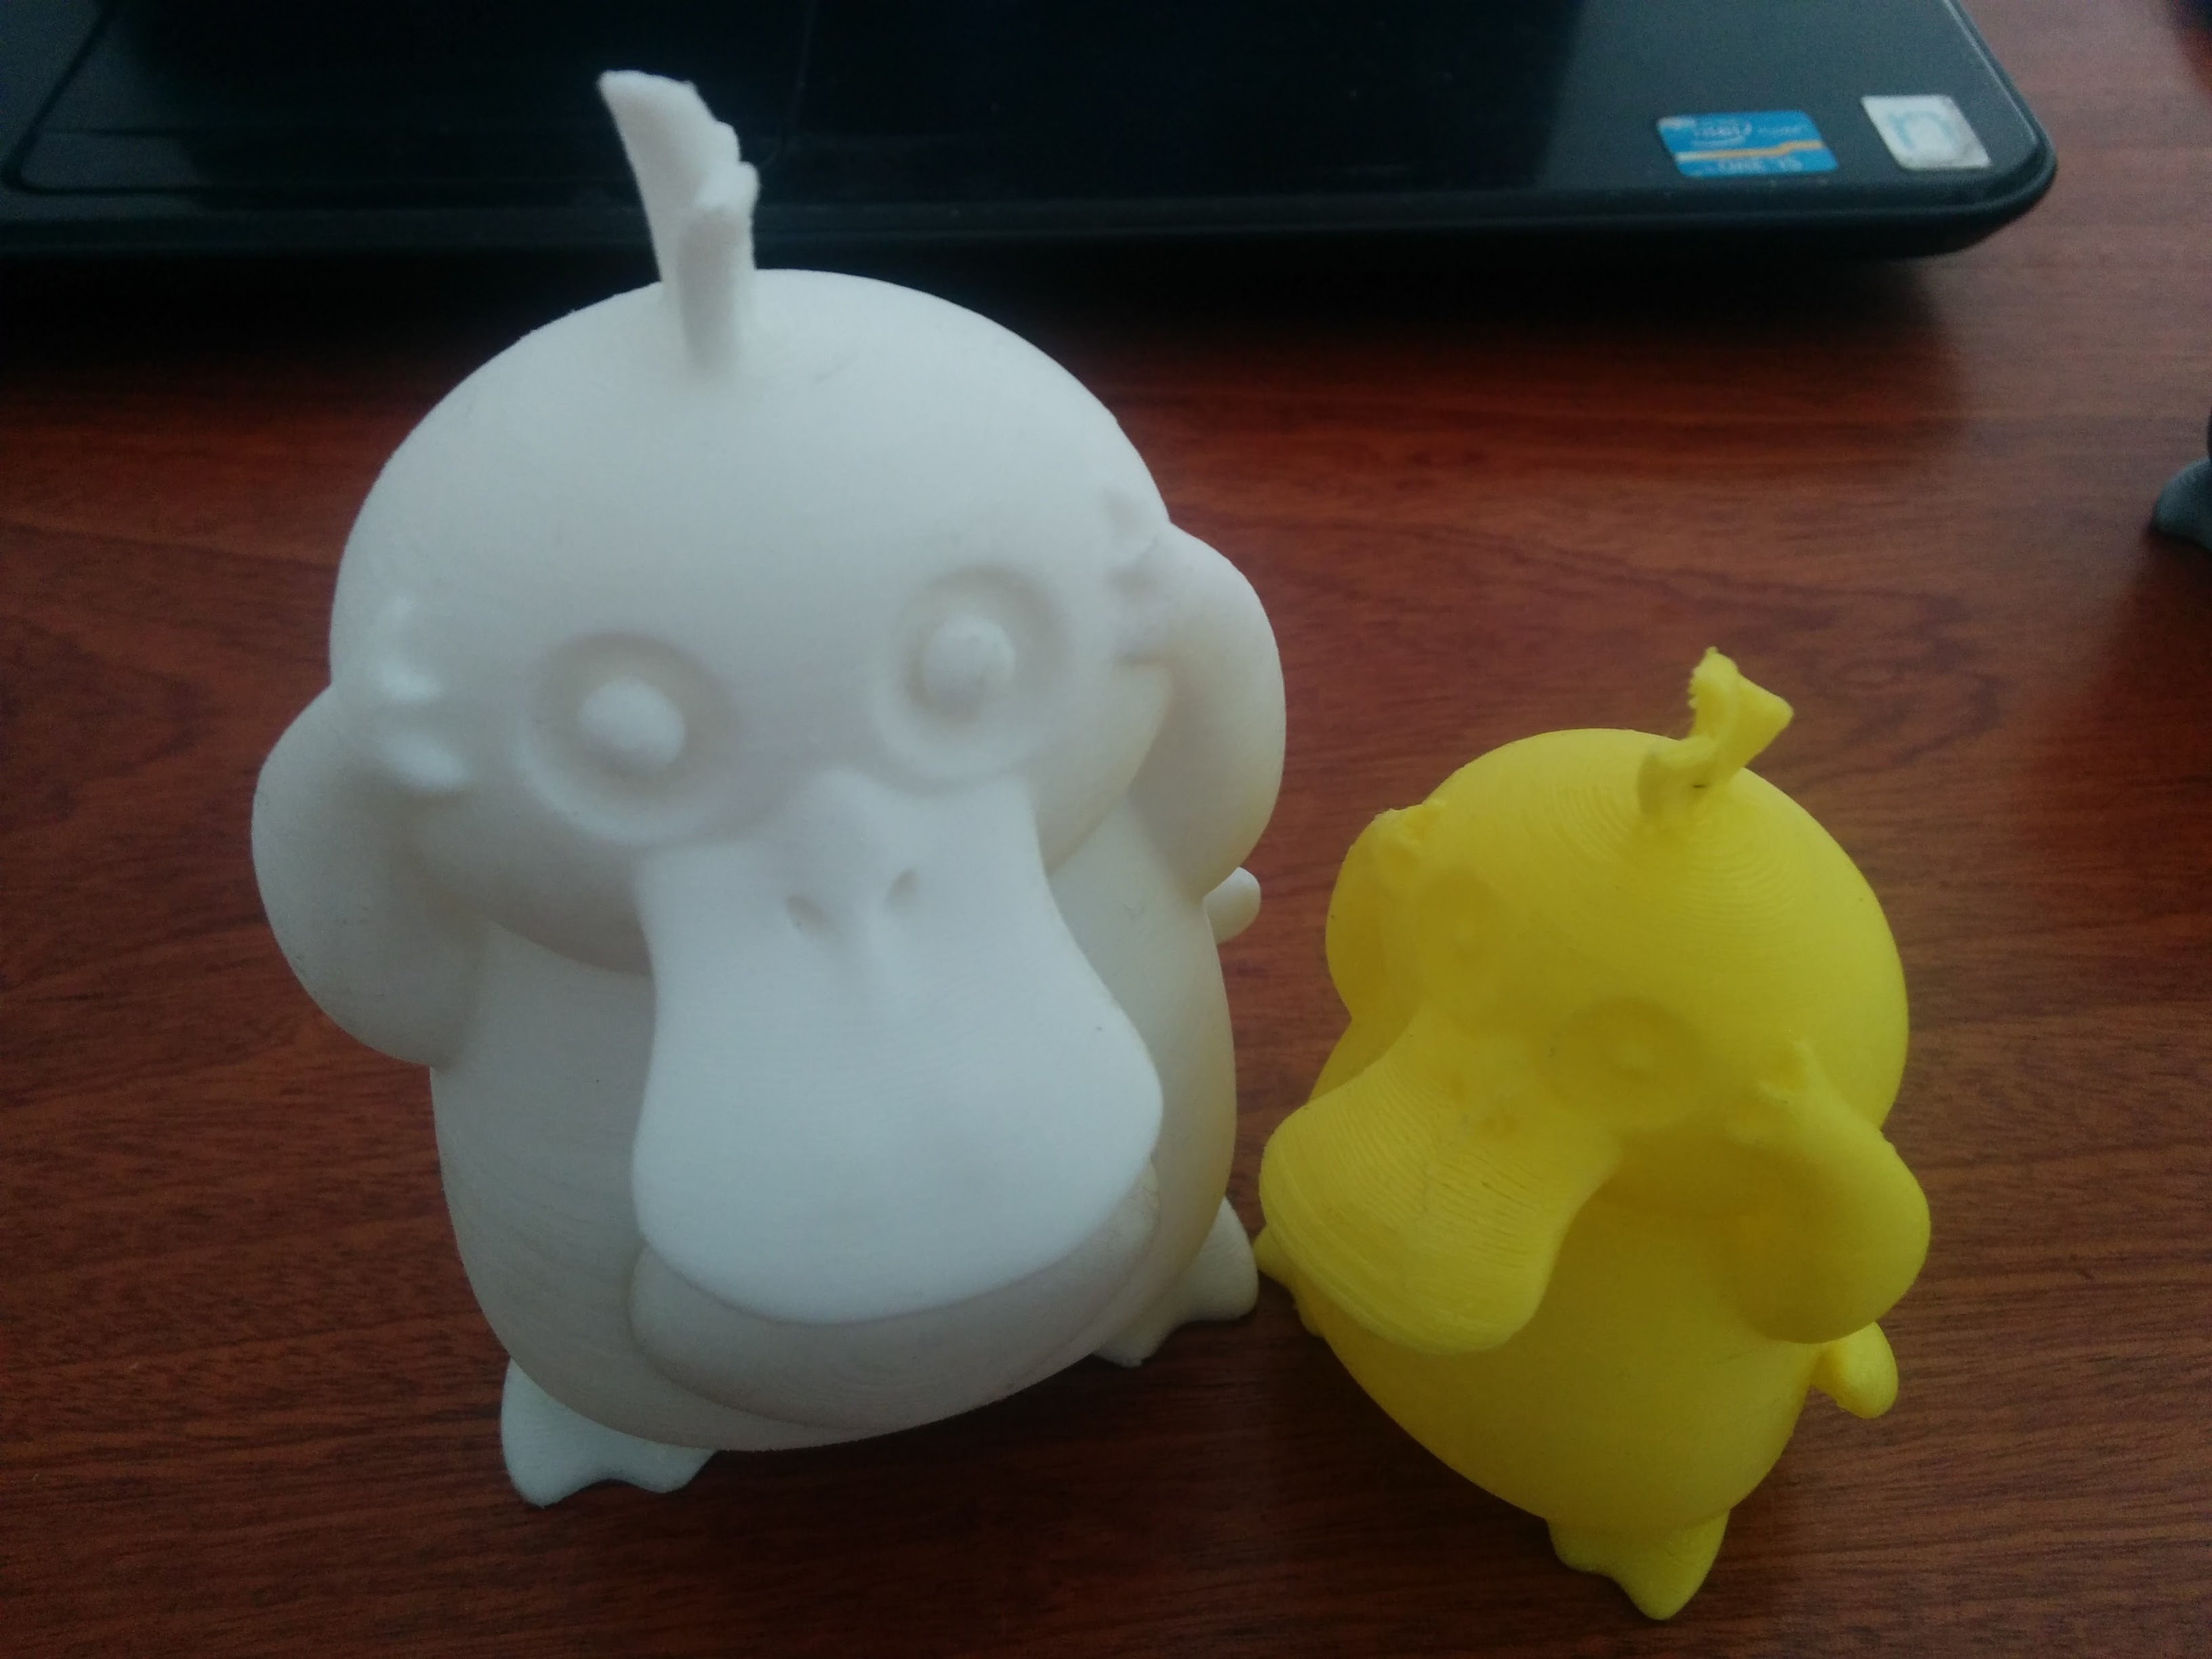 Mẫu vịt PsyDuck trong game Pokemon